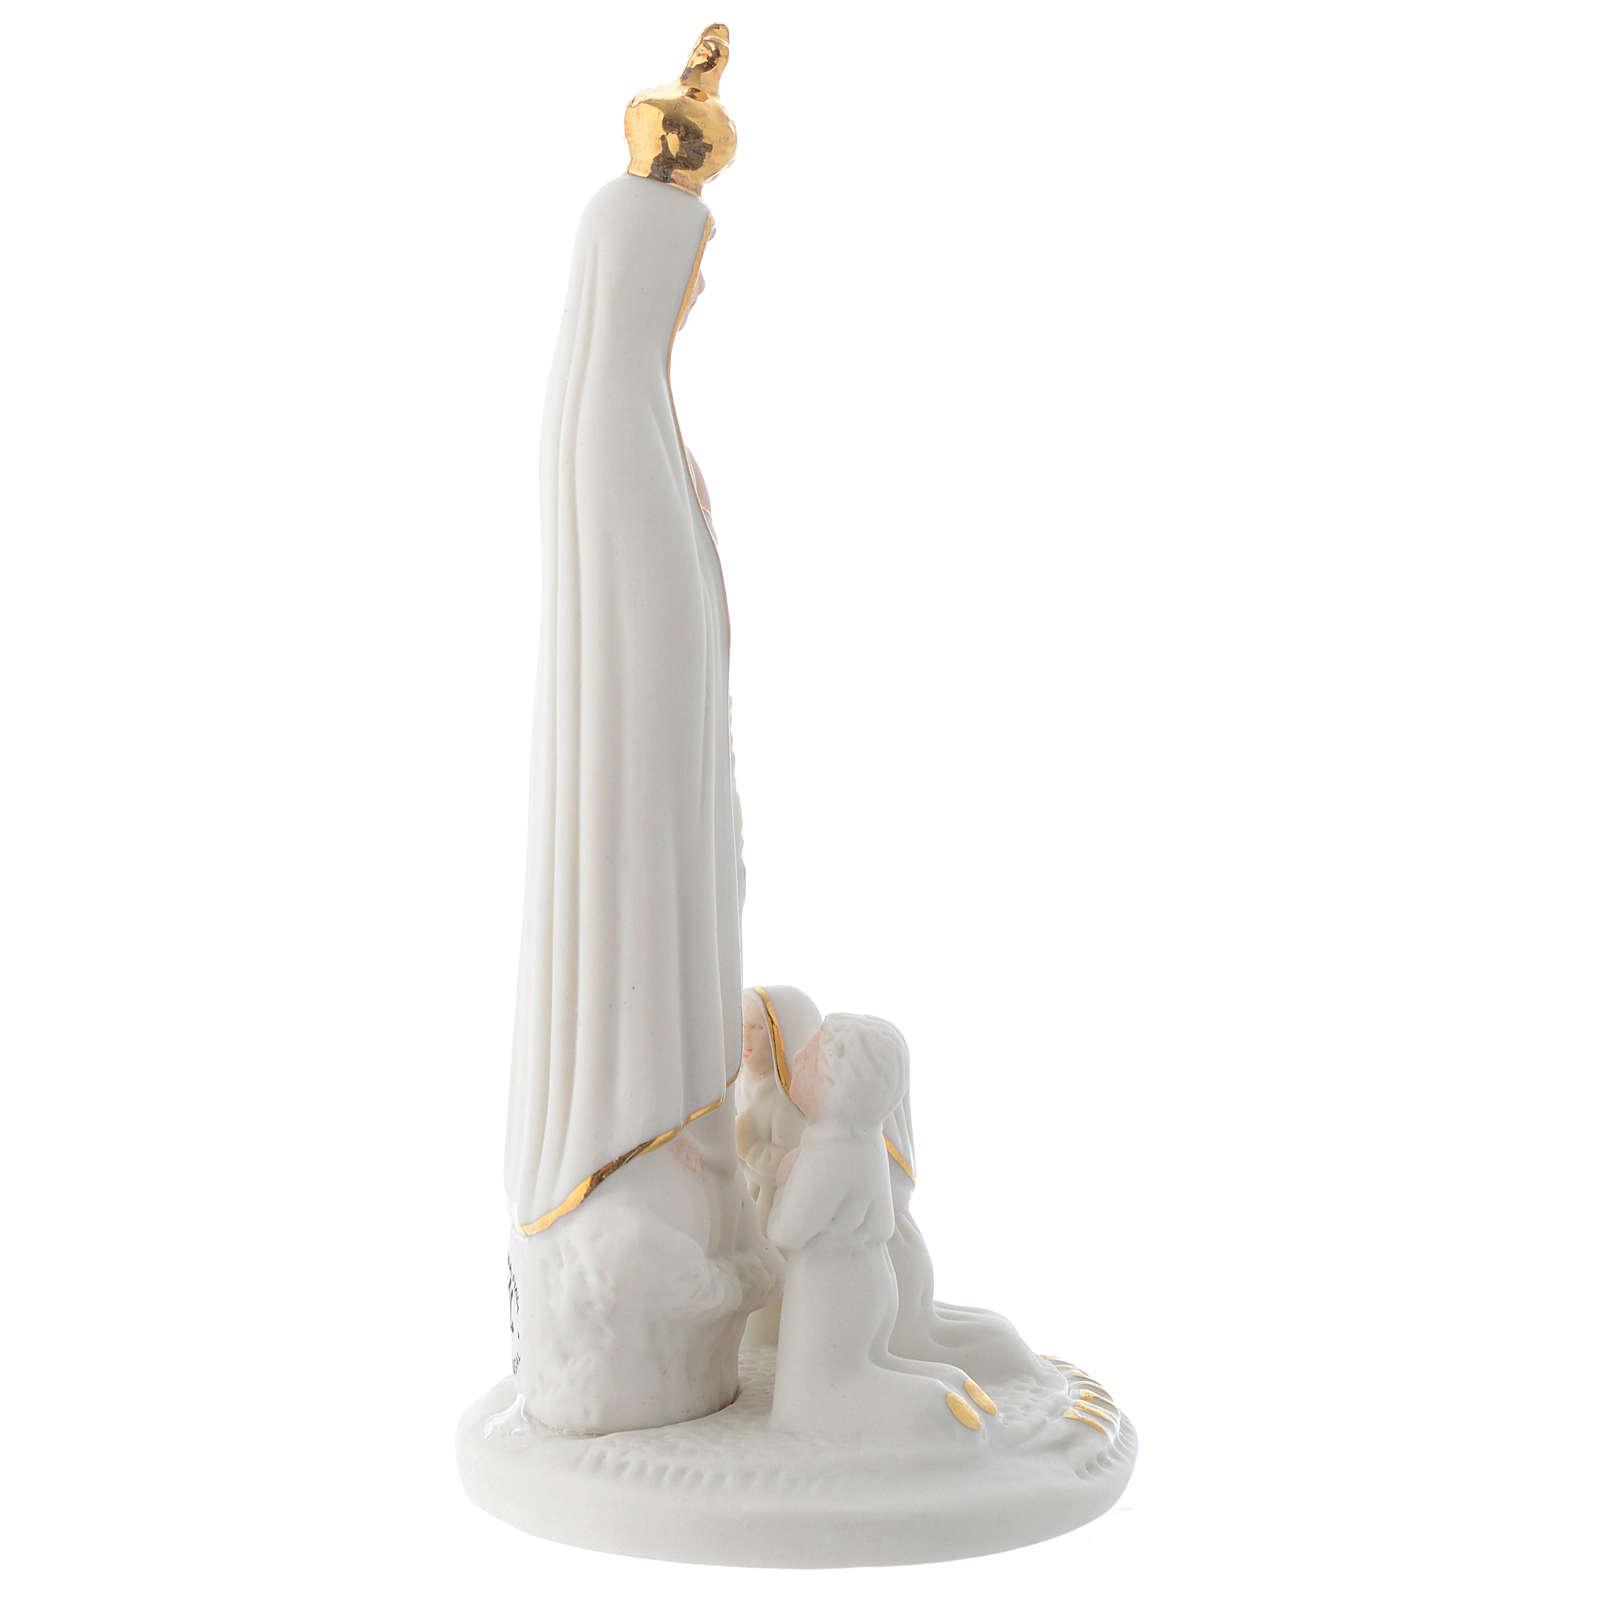 Imagen Virgen de Fatima porcelana con Tres Pastorcitos 13 cm 4